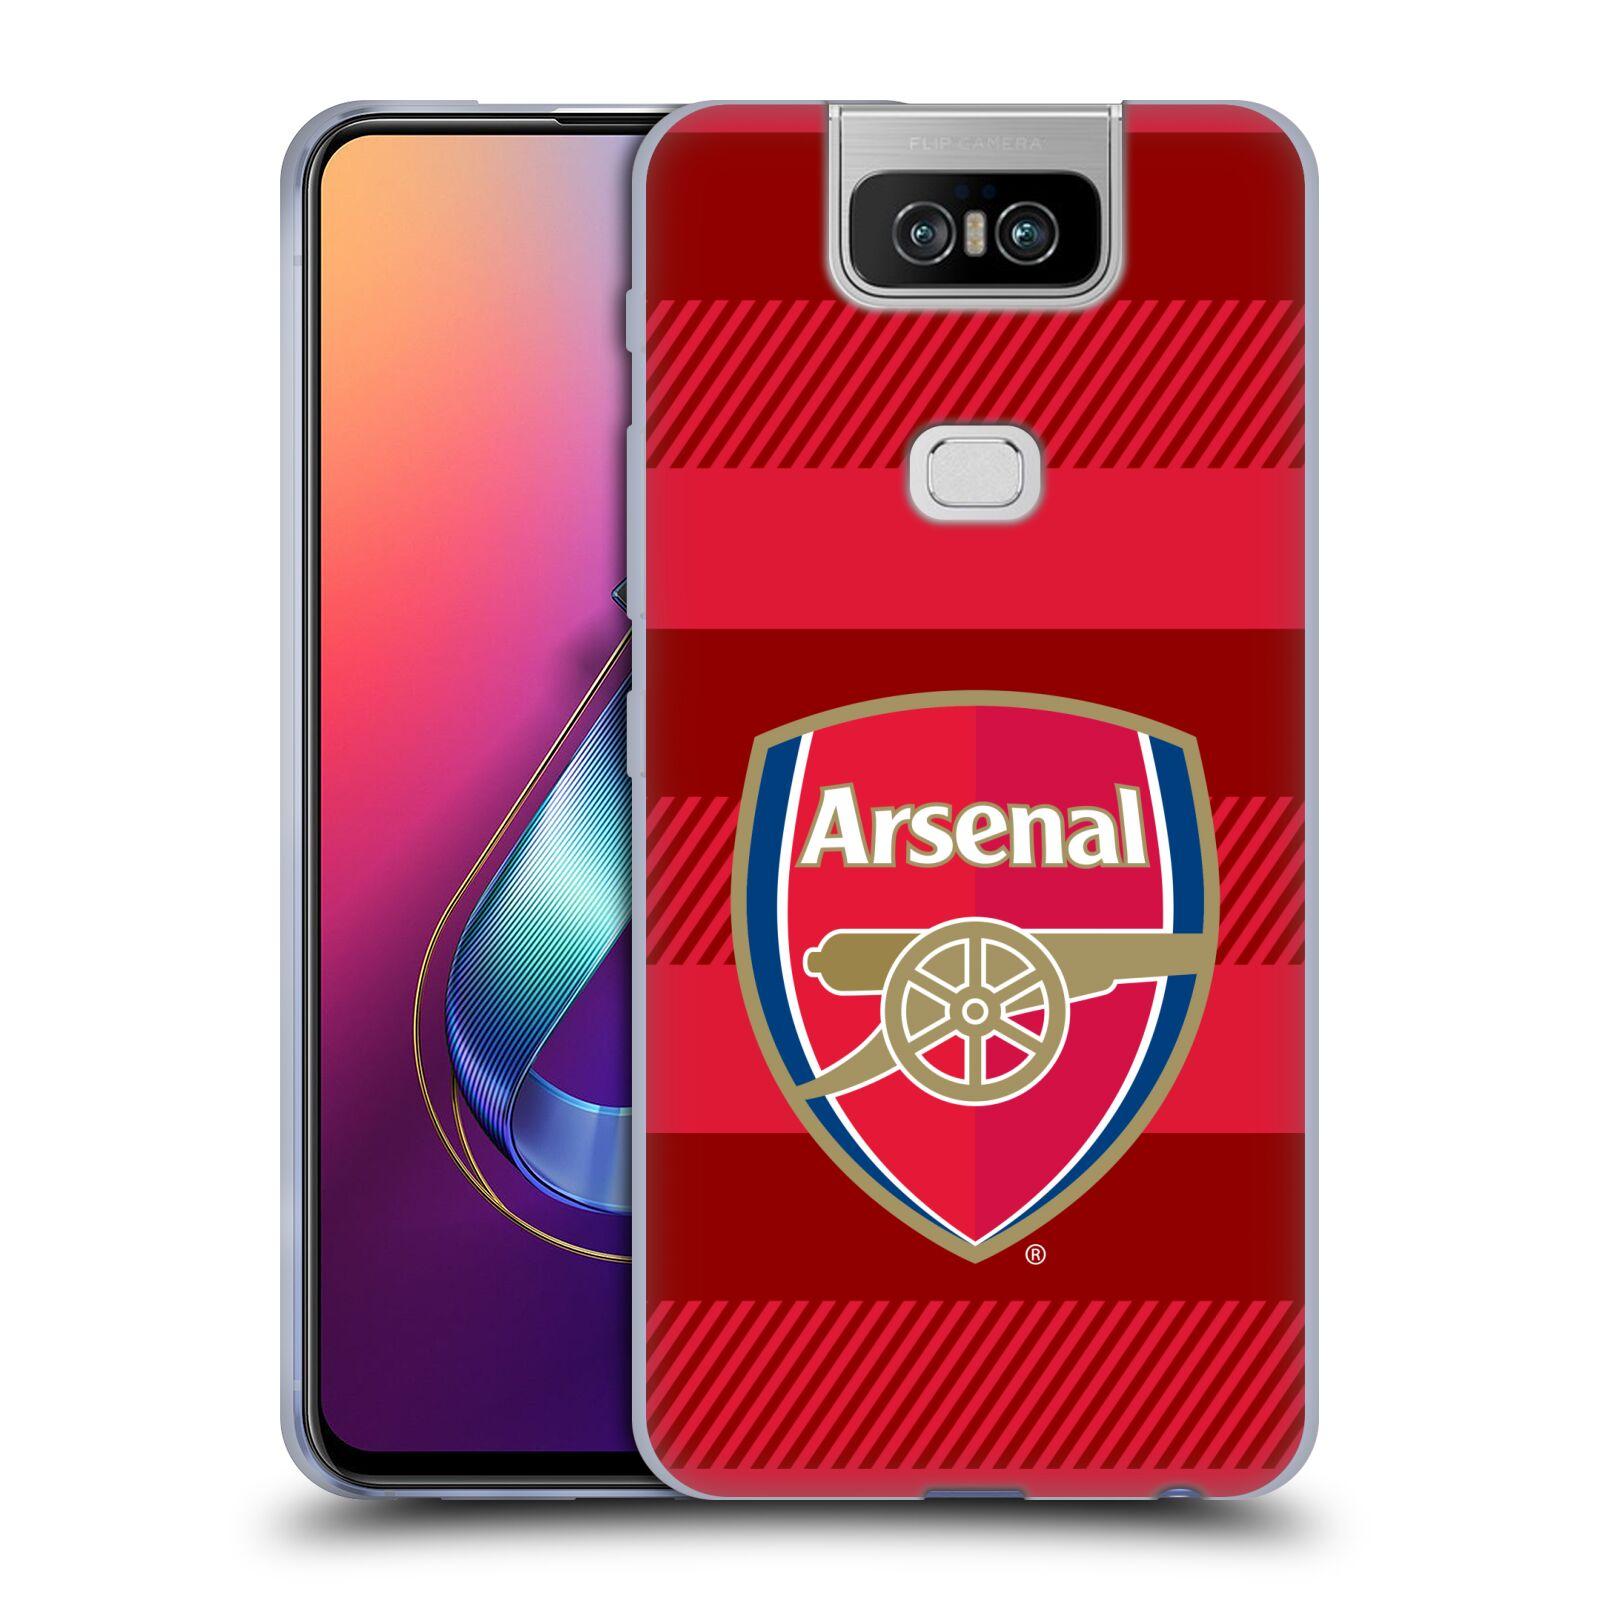 Silikonové pouzdro na mobil Asus Zenfone 6 ZS630KL - Head Case - Arsenal FC - Logo s pruhy